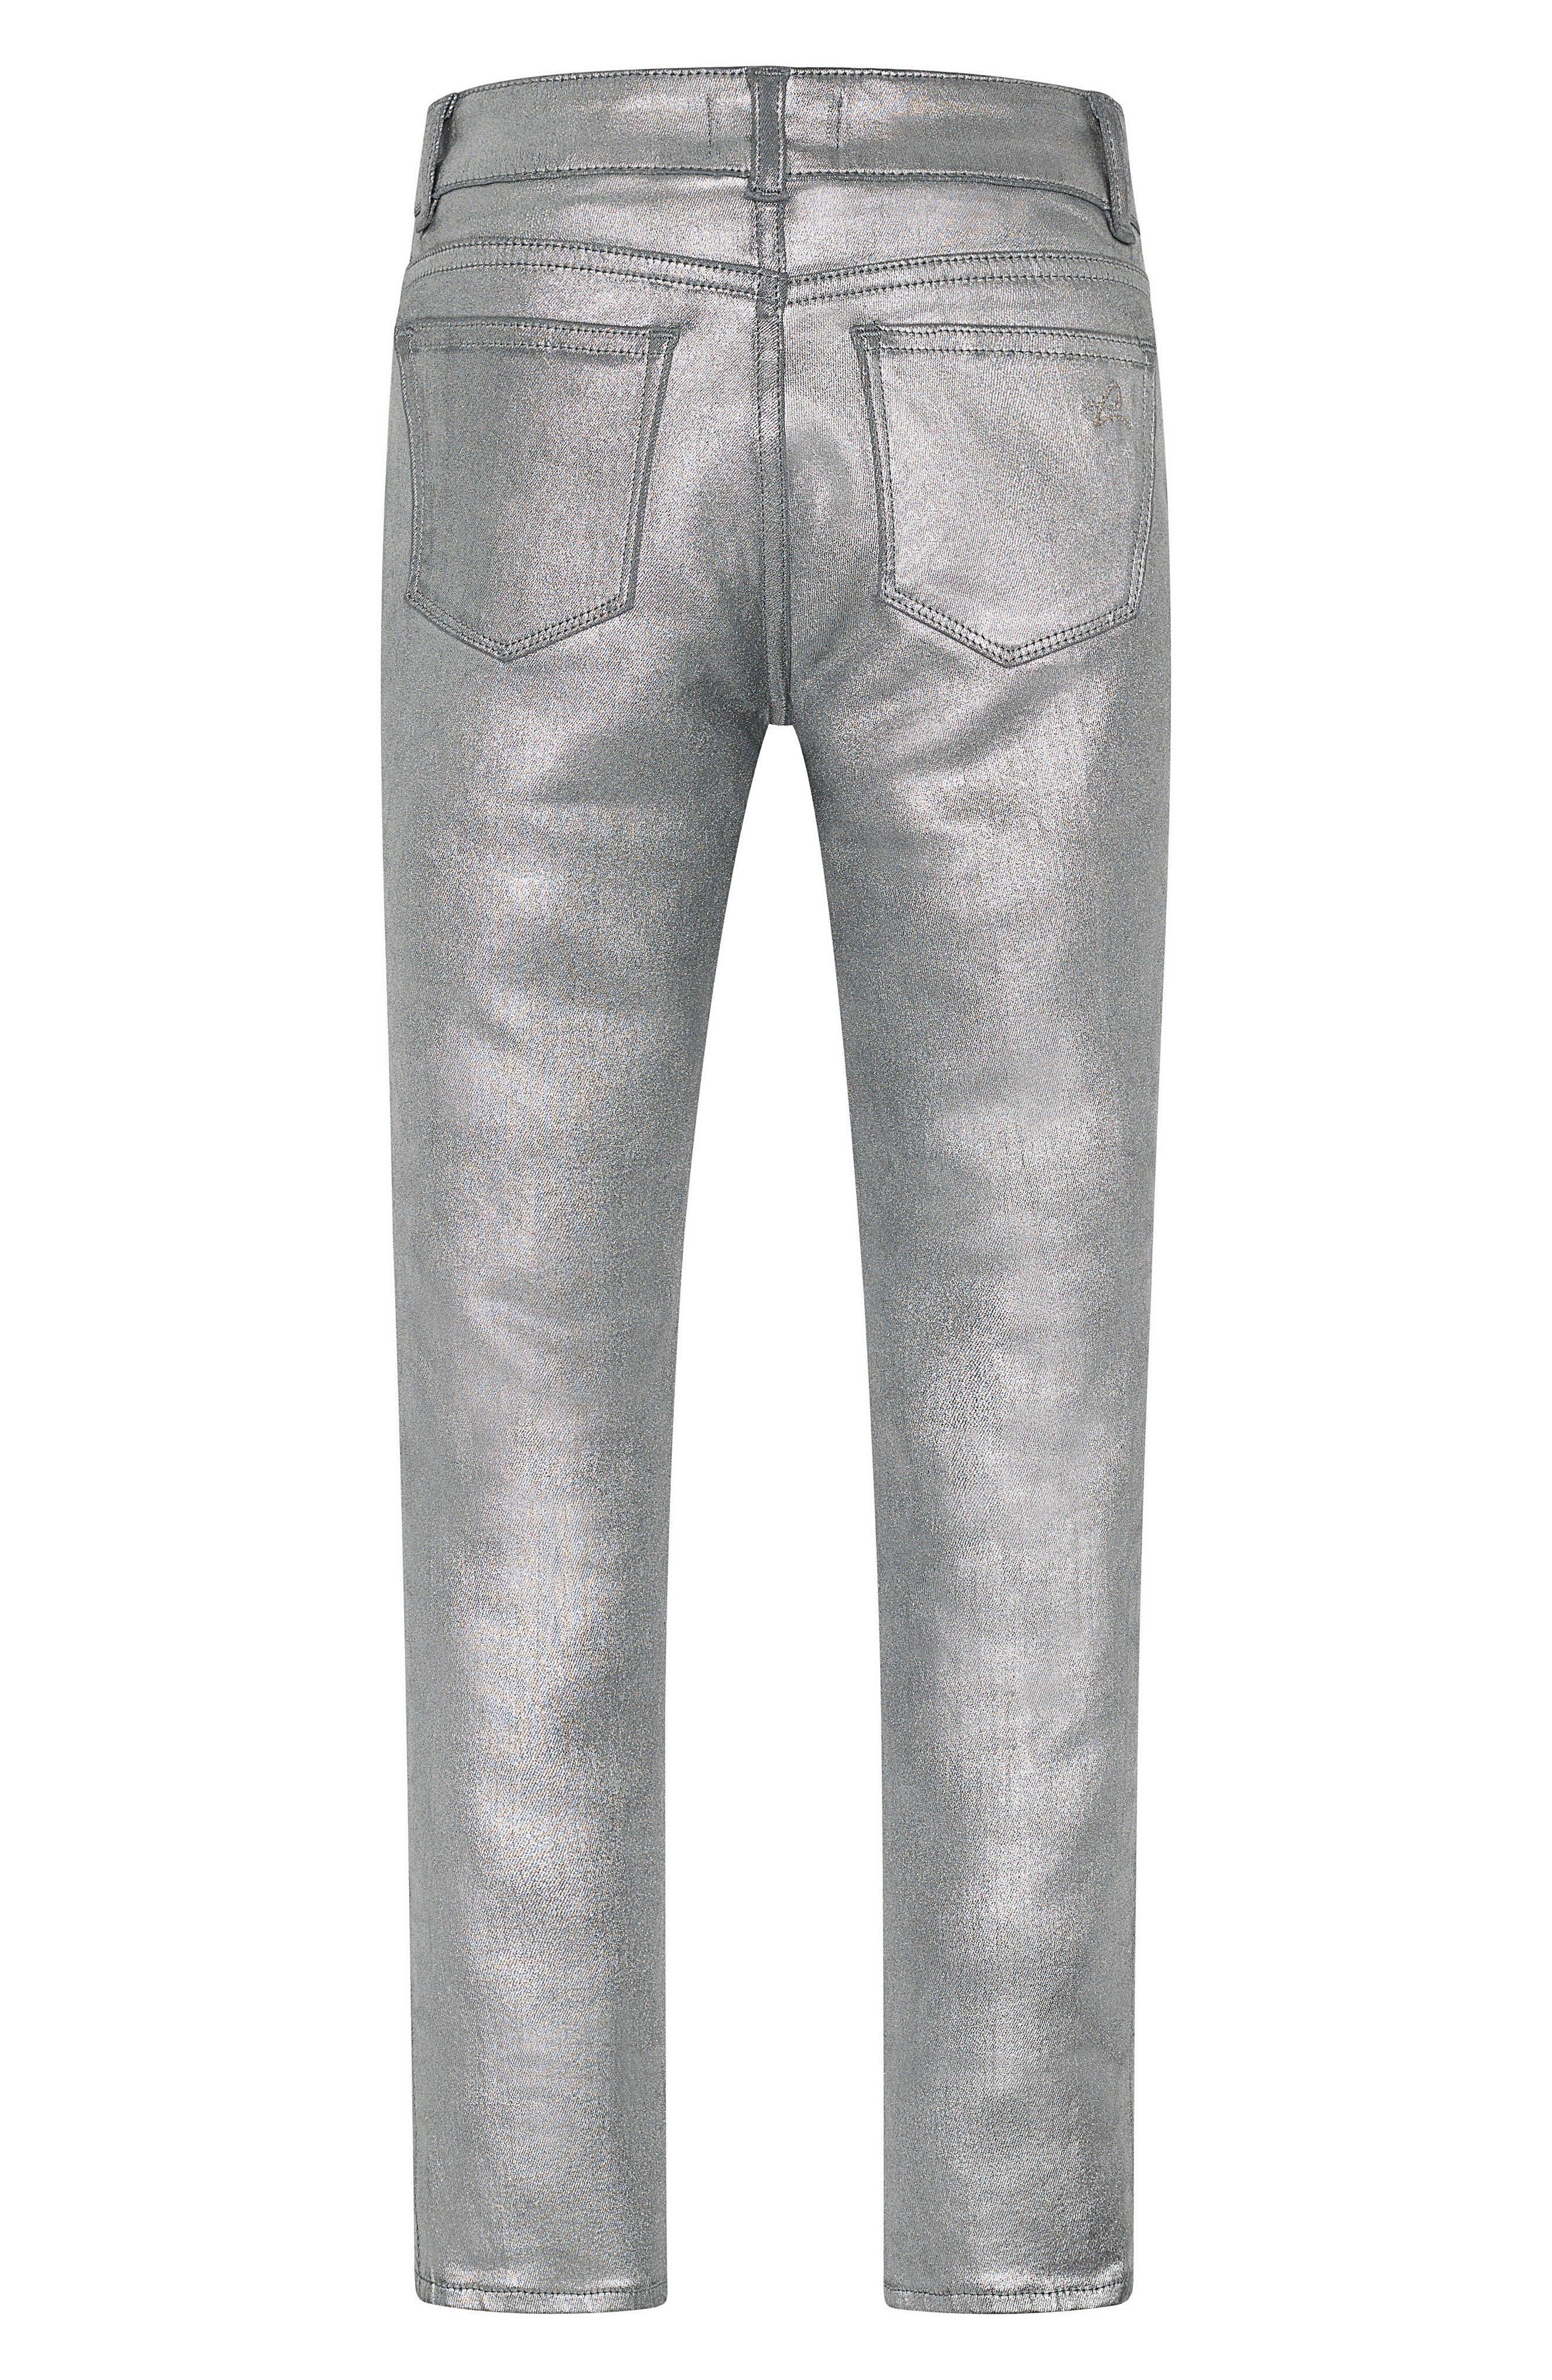 Chloe Coated Skinny Jeans,                             Alternate thumbnail 2, color,                             Silverado